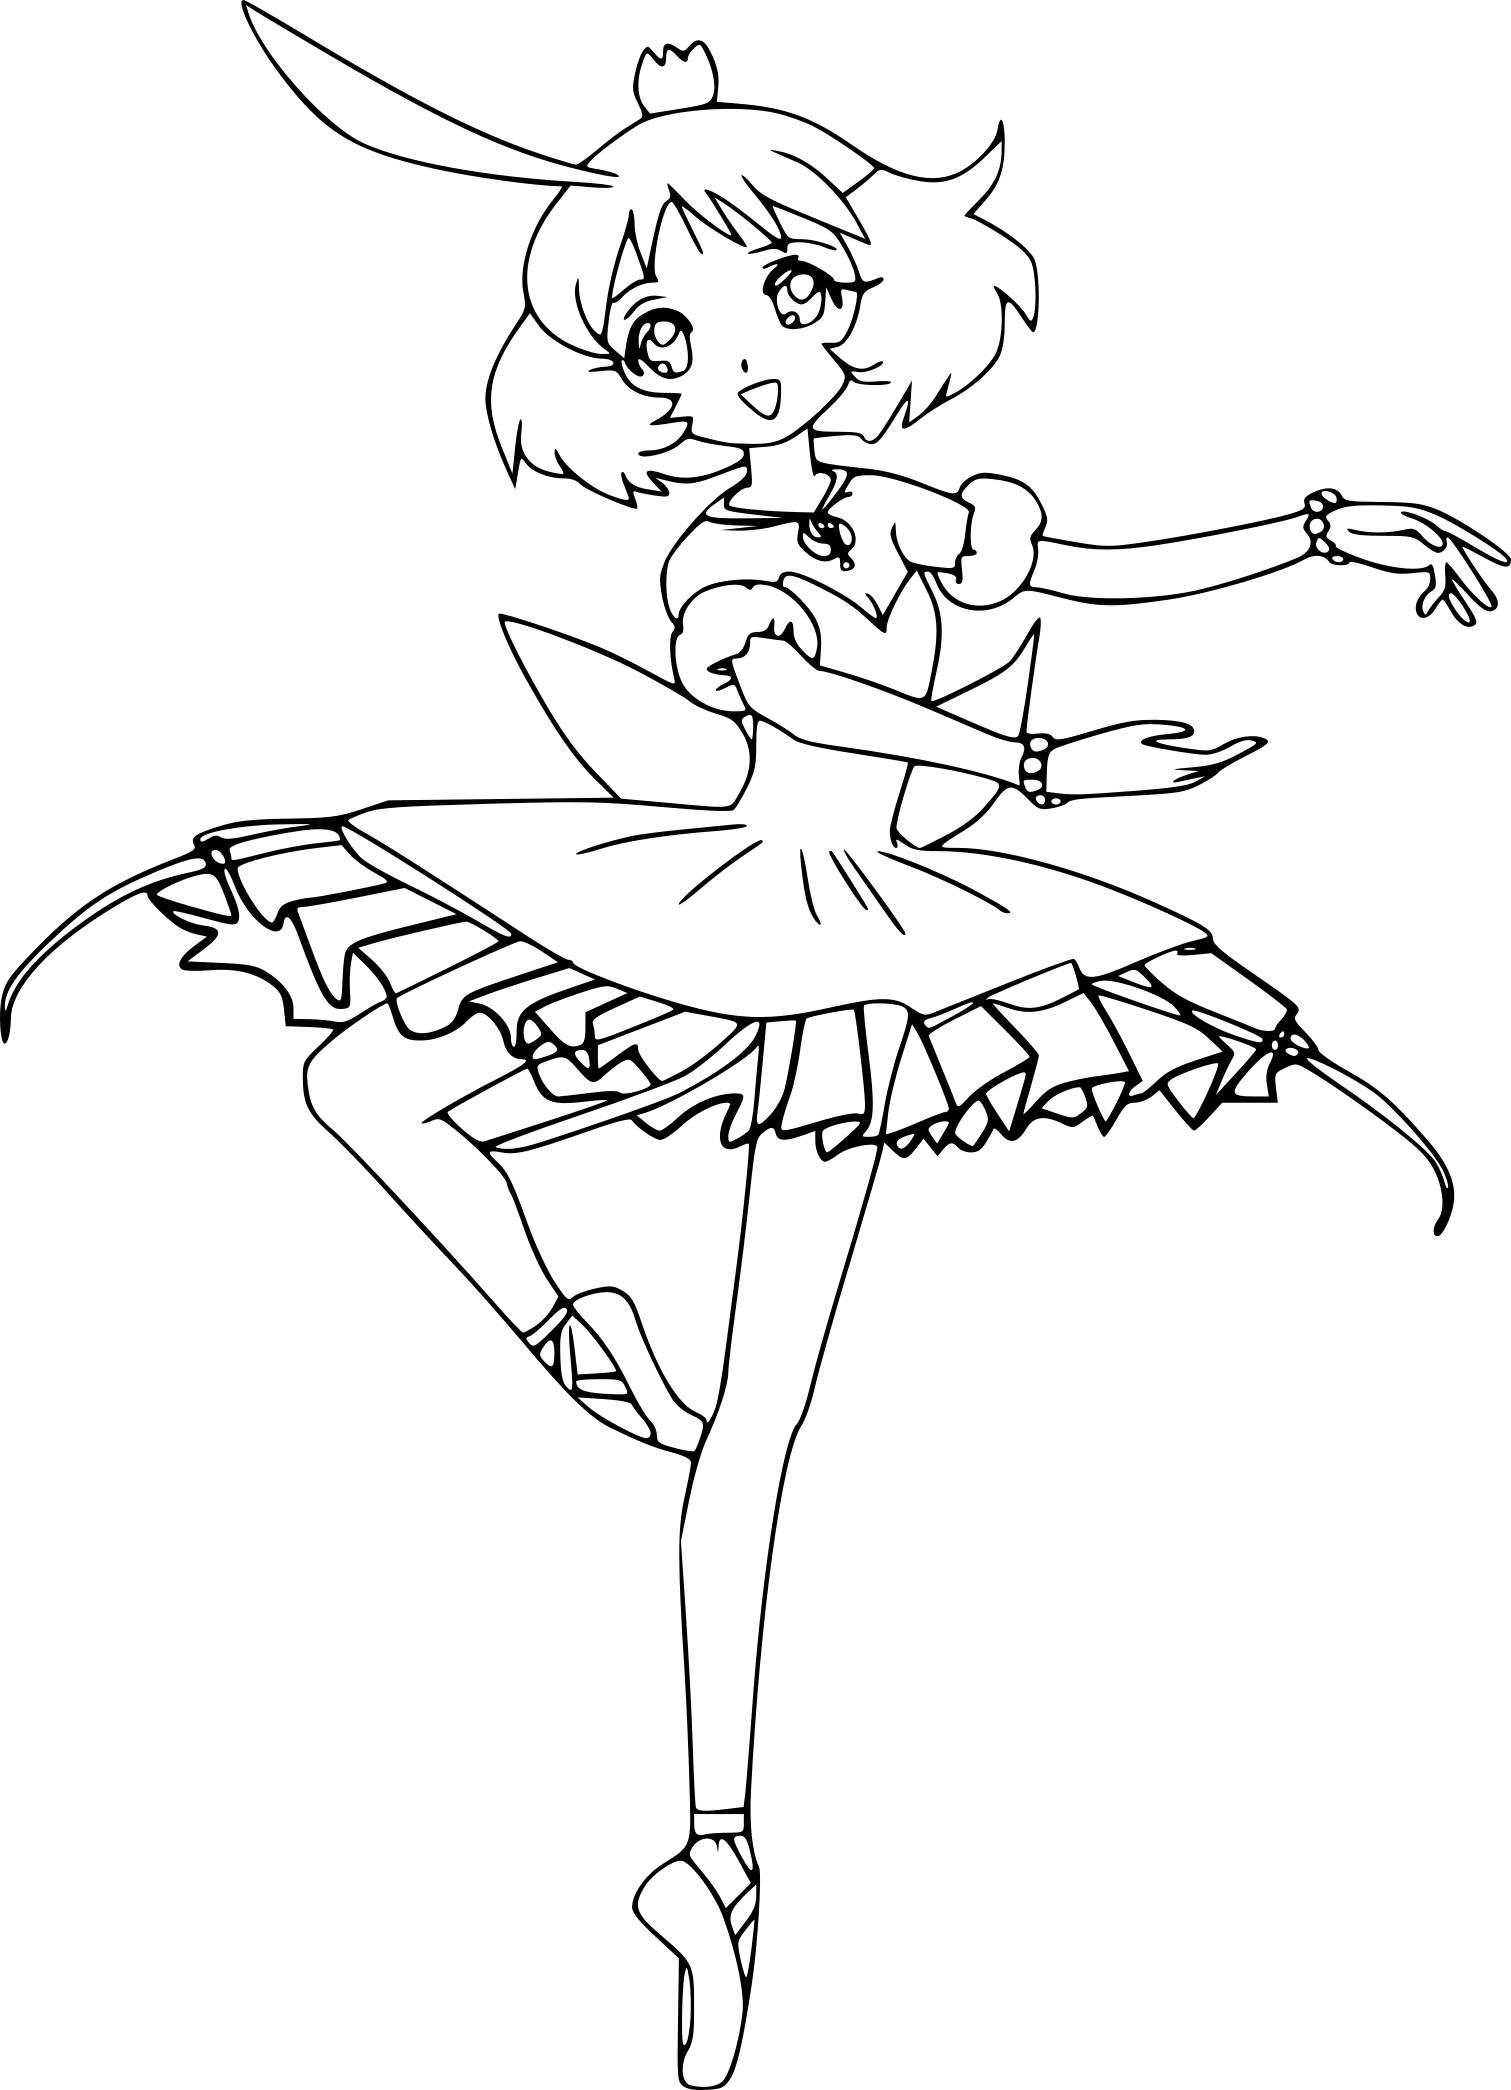 Dessin De Danseuse Classique